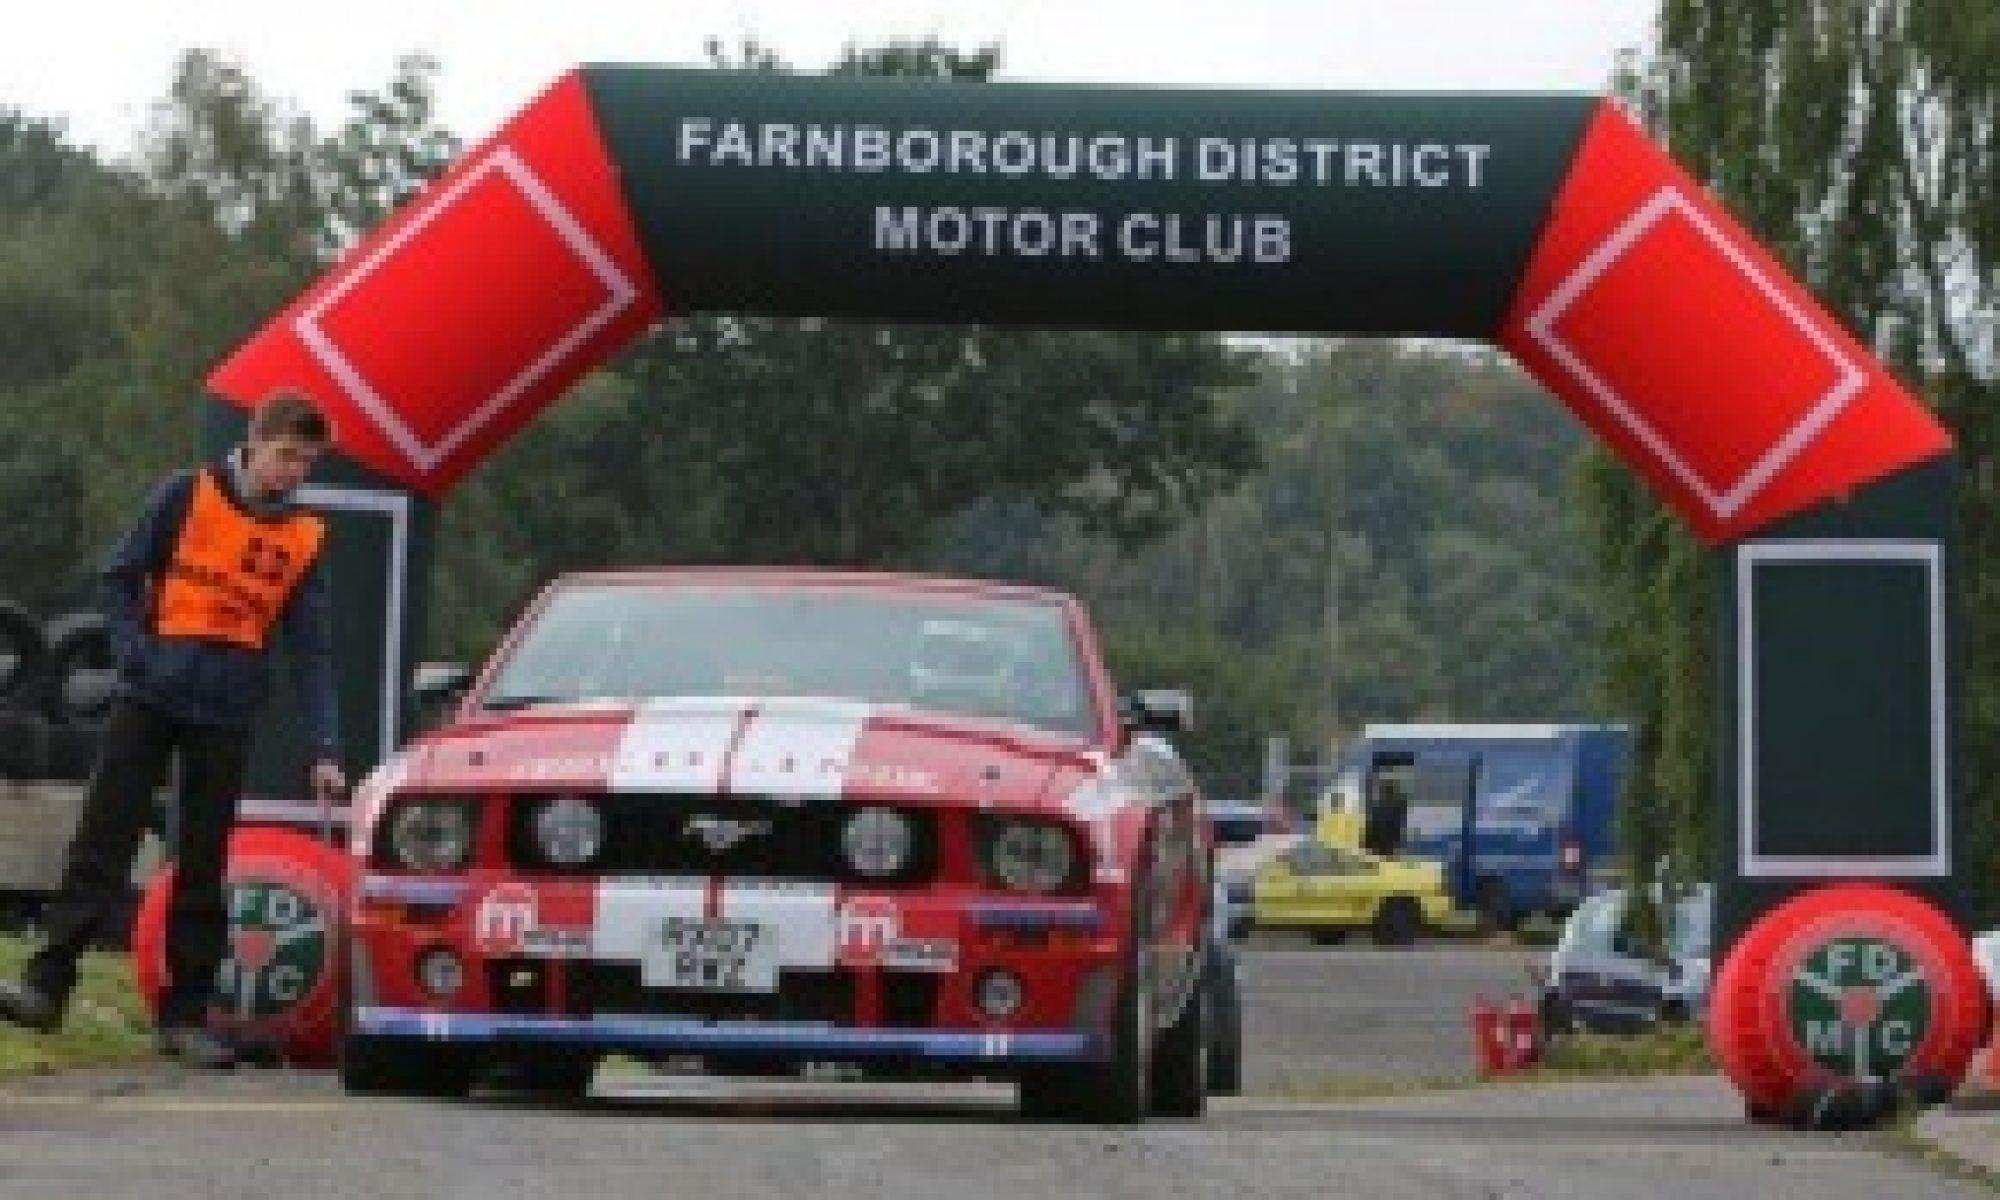 Farnborough District Motor Club (FDMC)